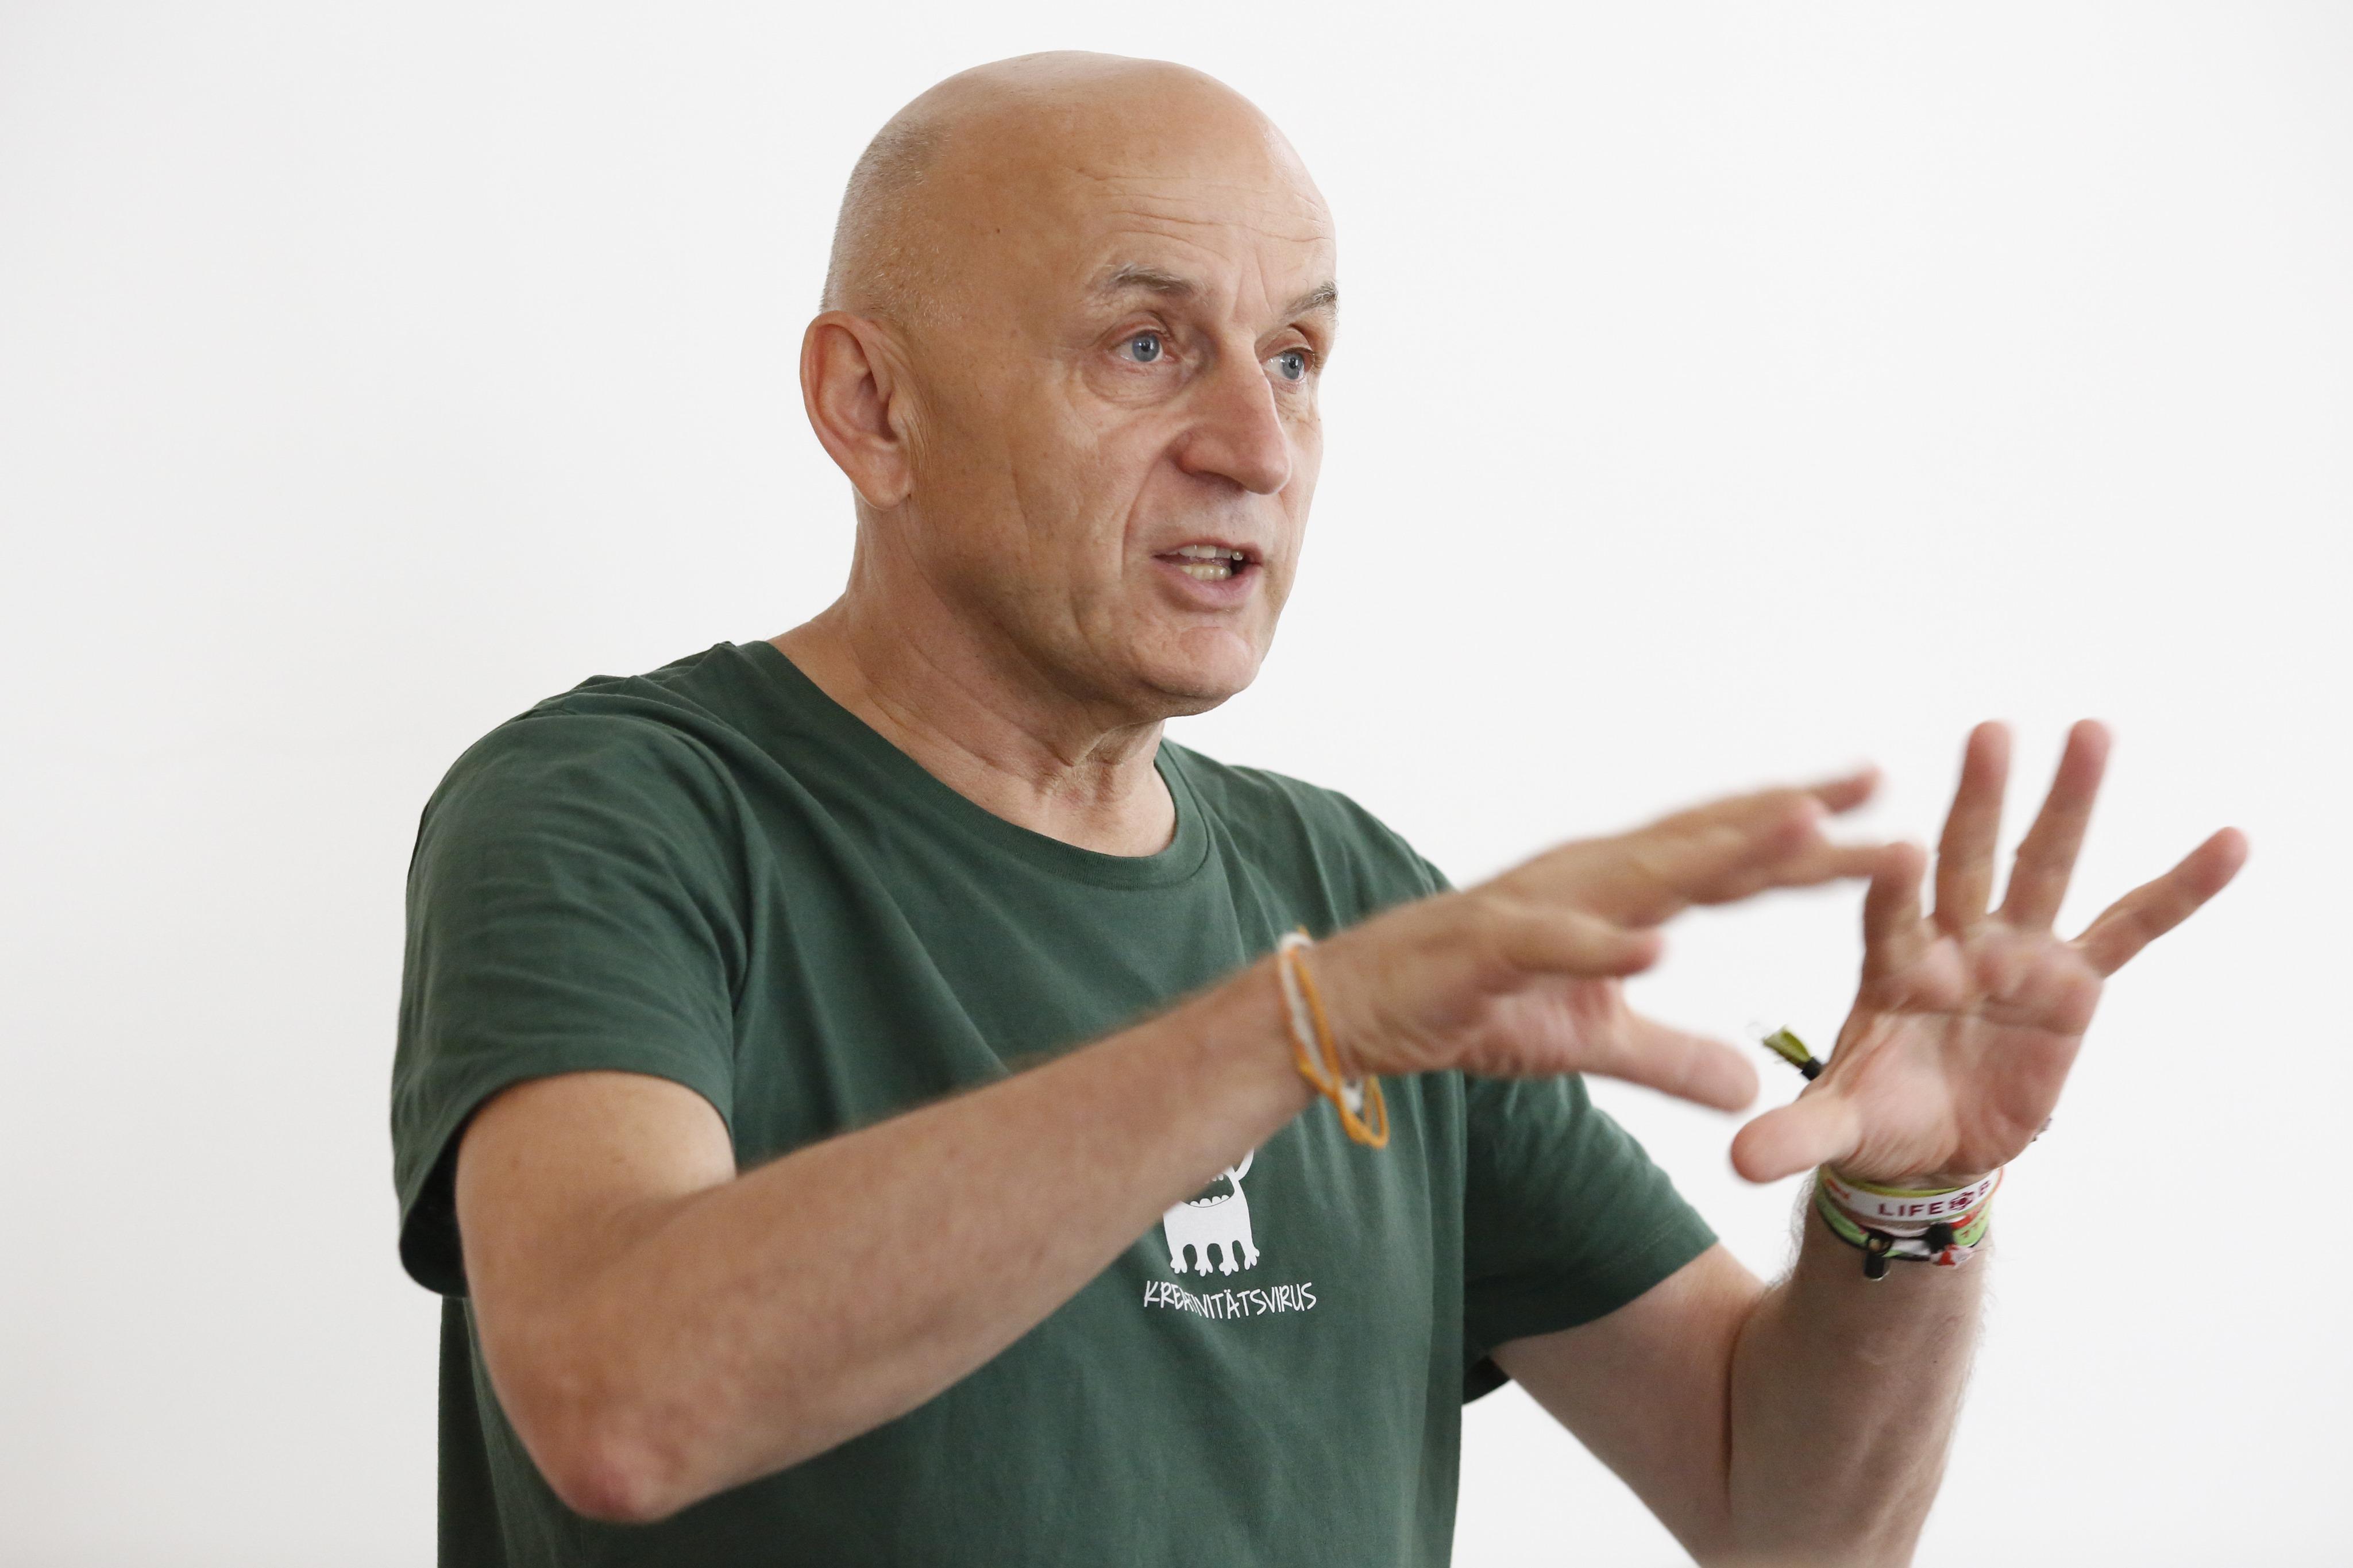 Reinhard Herok